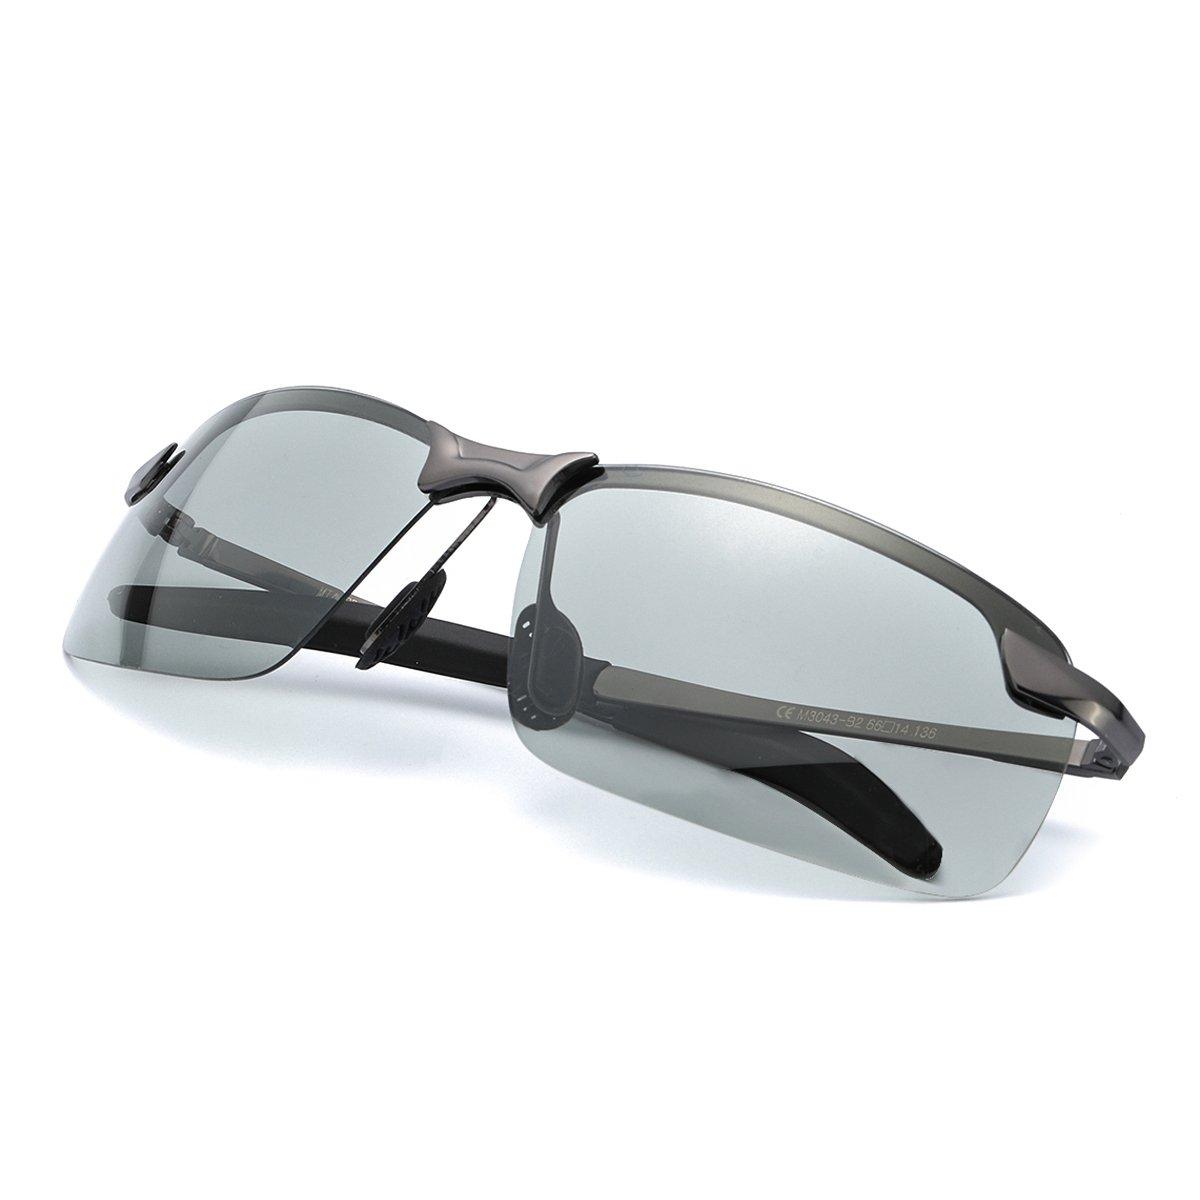 Mens Photochromic Sunglasses Polarized for Driving Rectangular Frame with 100% UVA UVB Protection